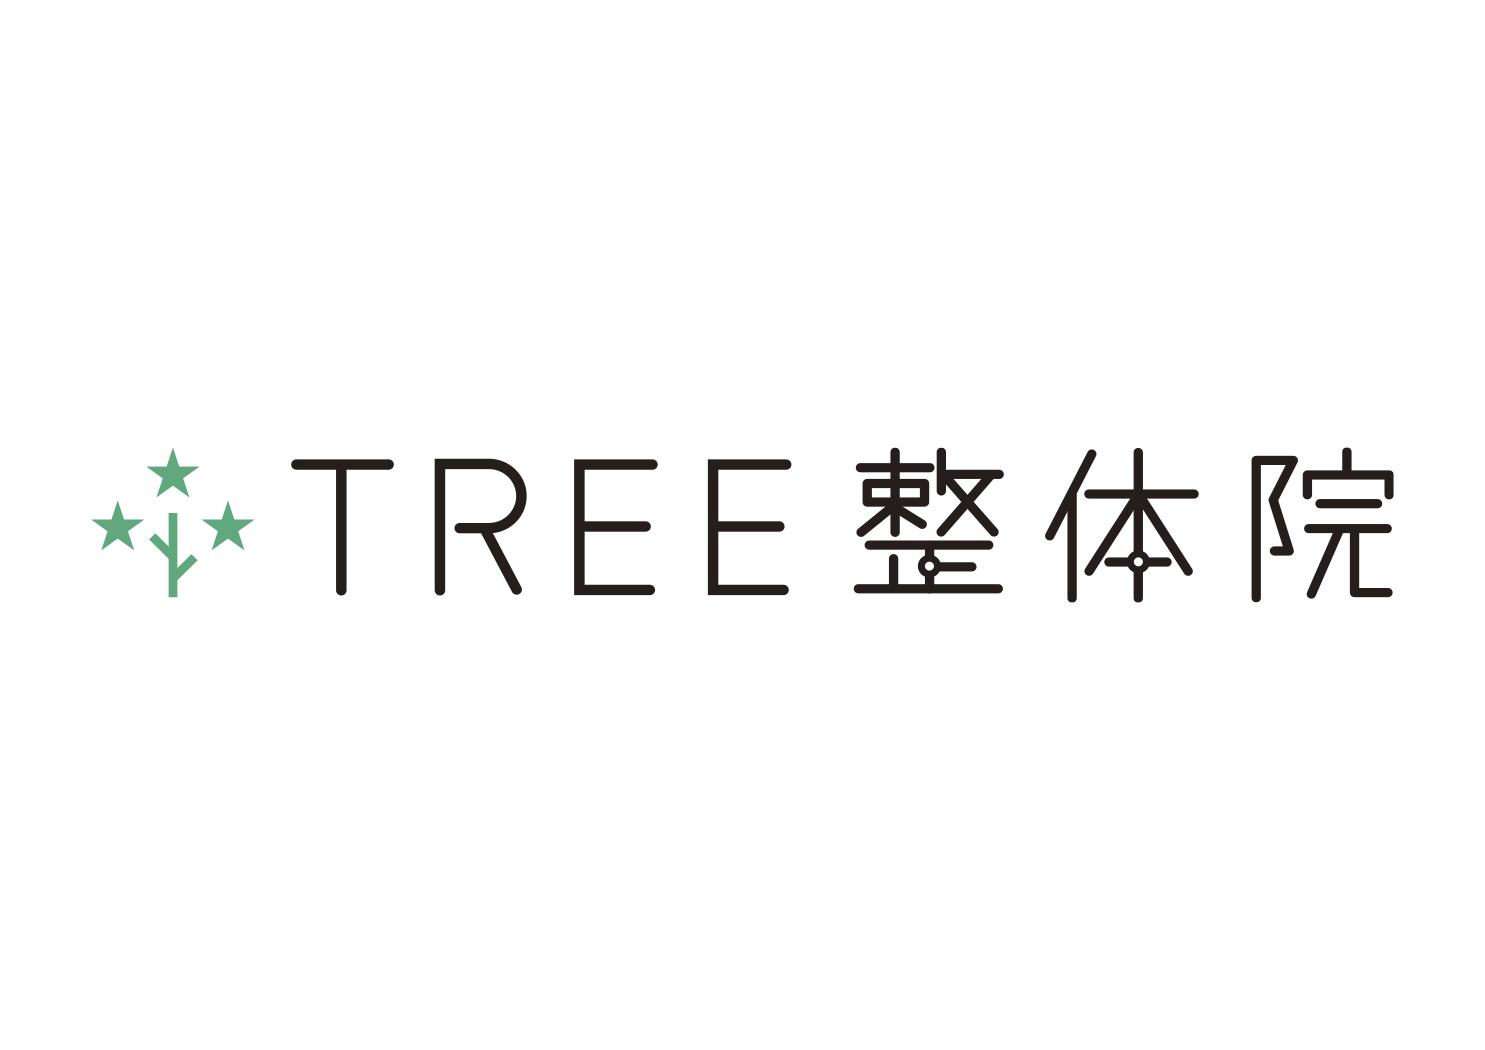 TREE Chiropractic clinic logo